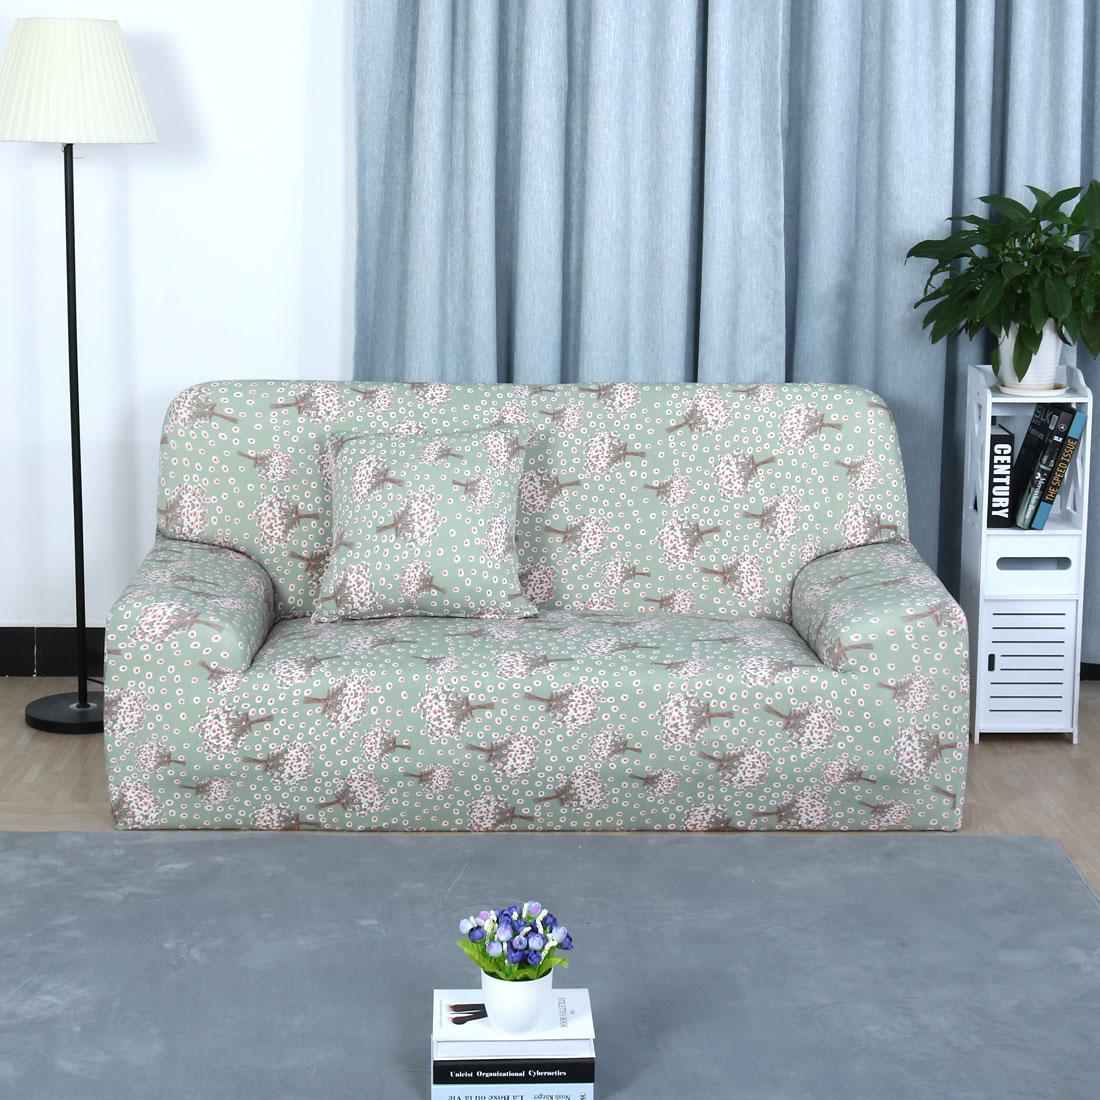 Piccocasa Hyacinth Pattern Sofa Loveseat Cover Slipcover Protector